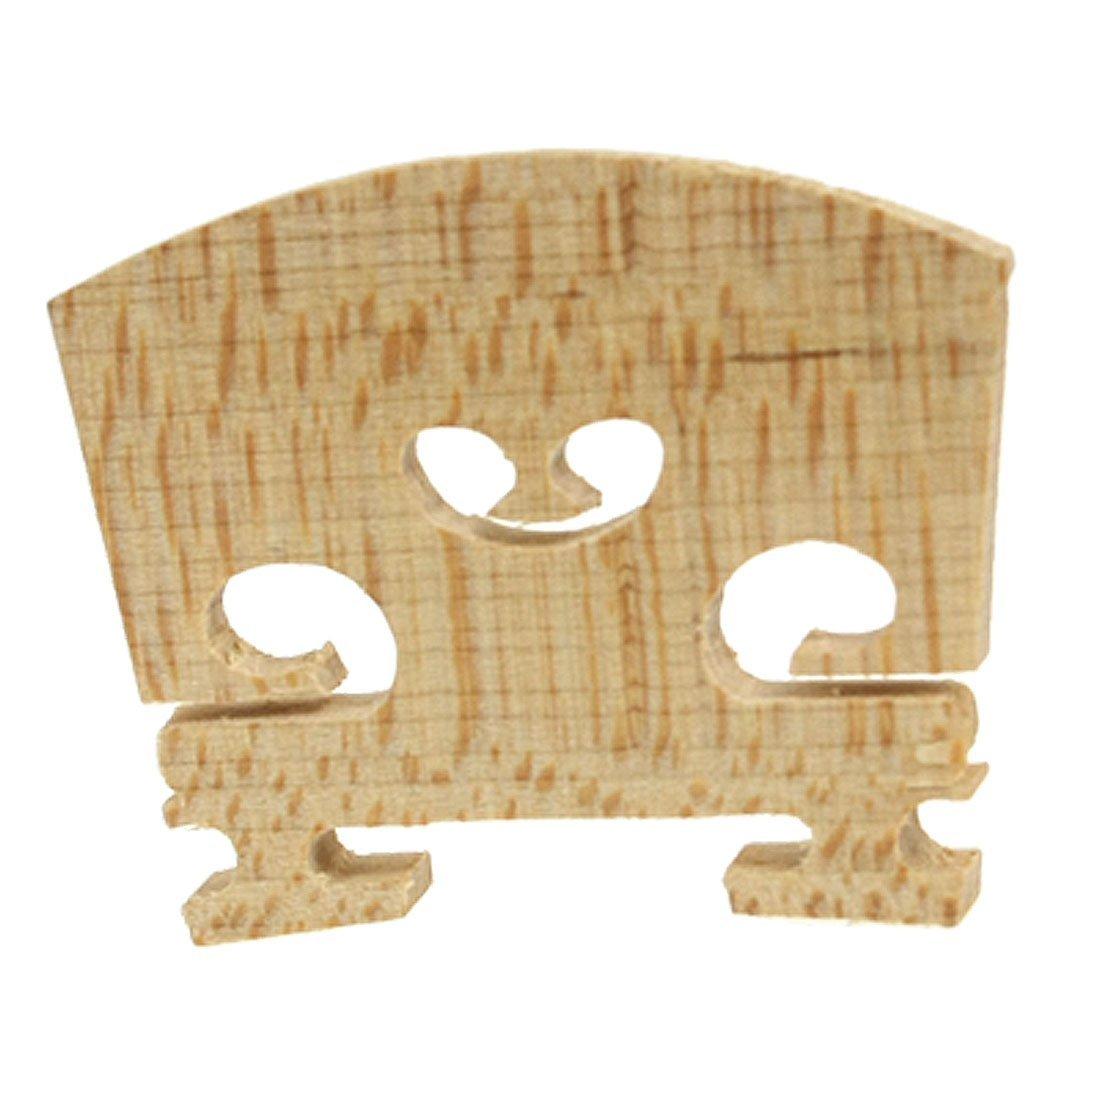 SODIAL(R) Replacement 1/4 Size Violin Parts String Centre Wooden Bridge